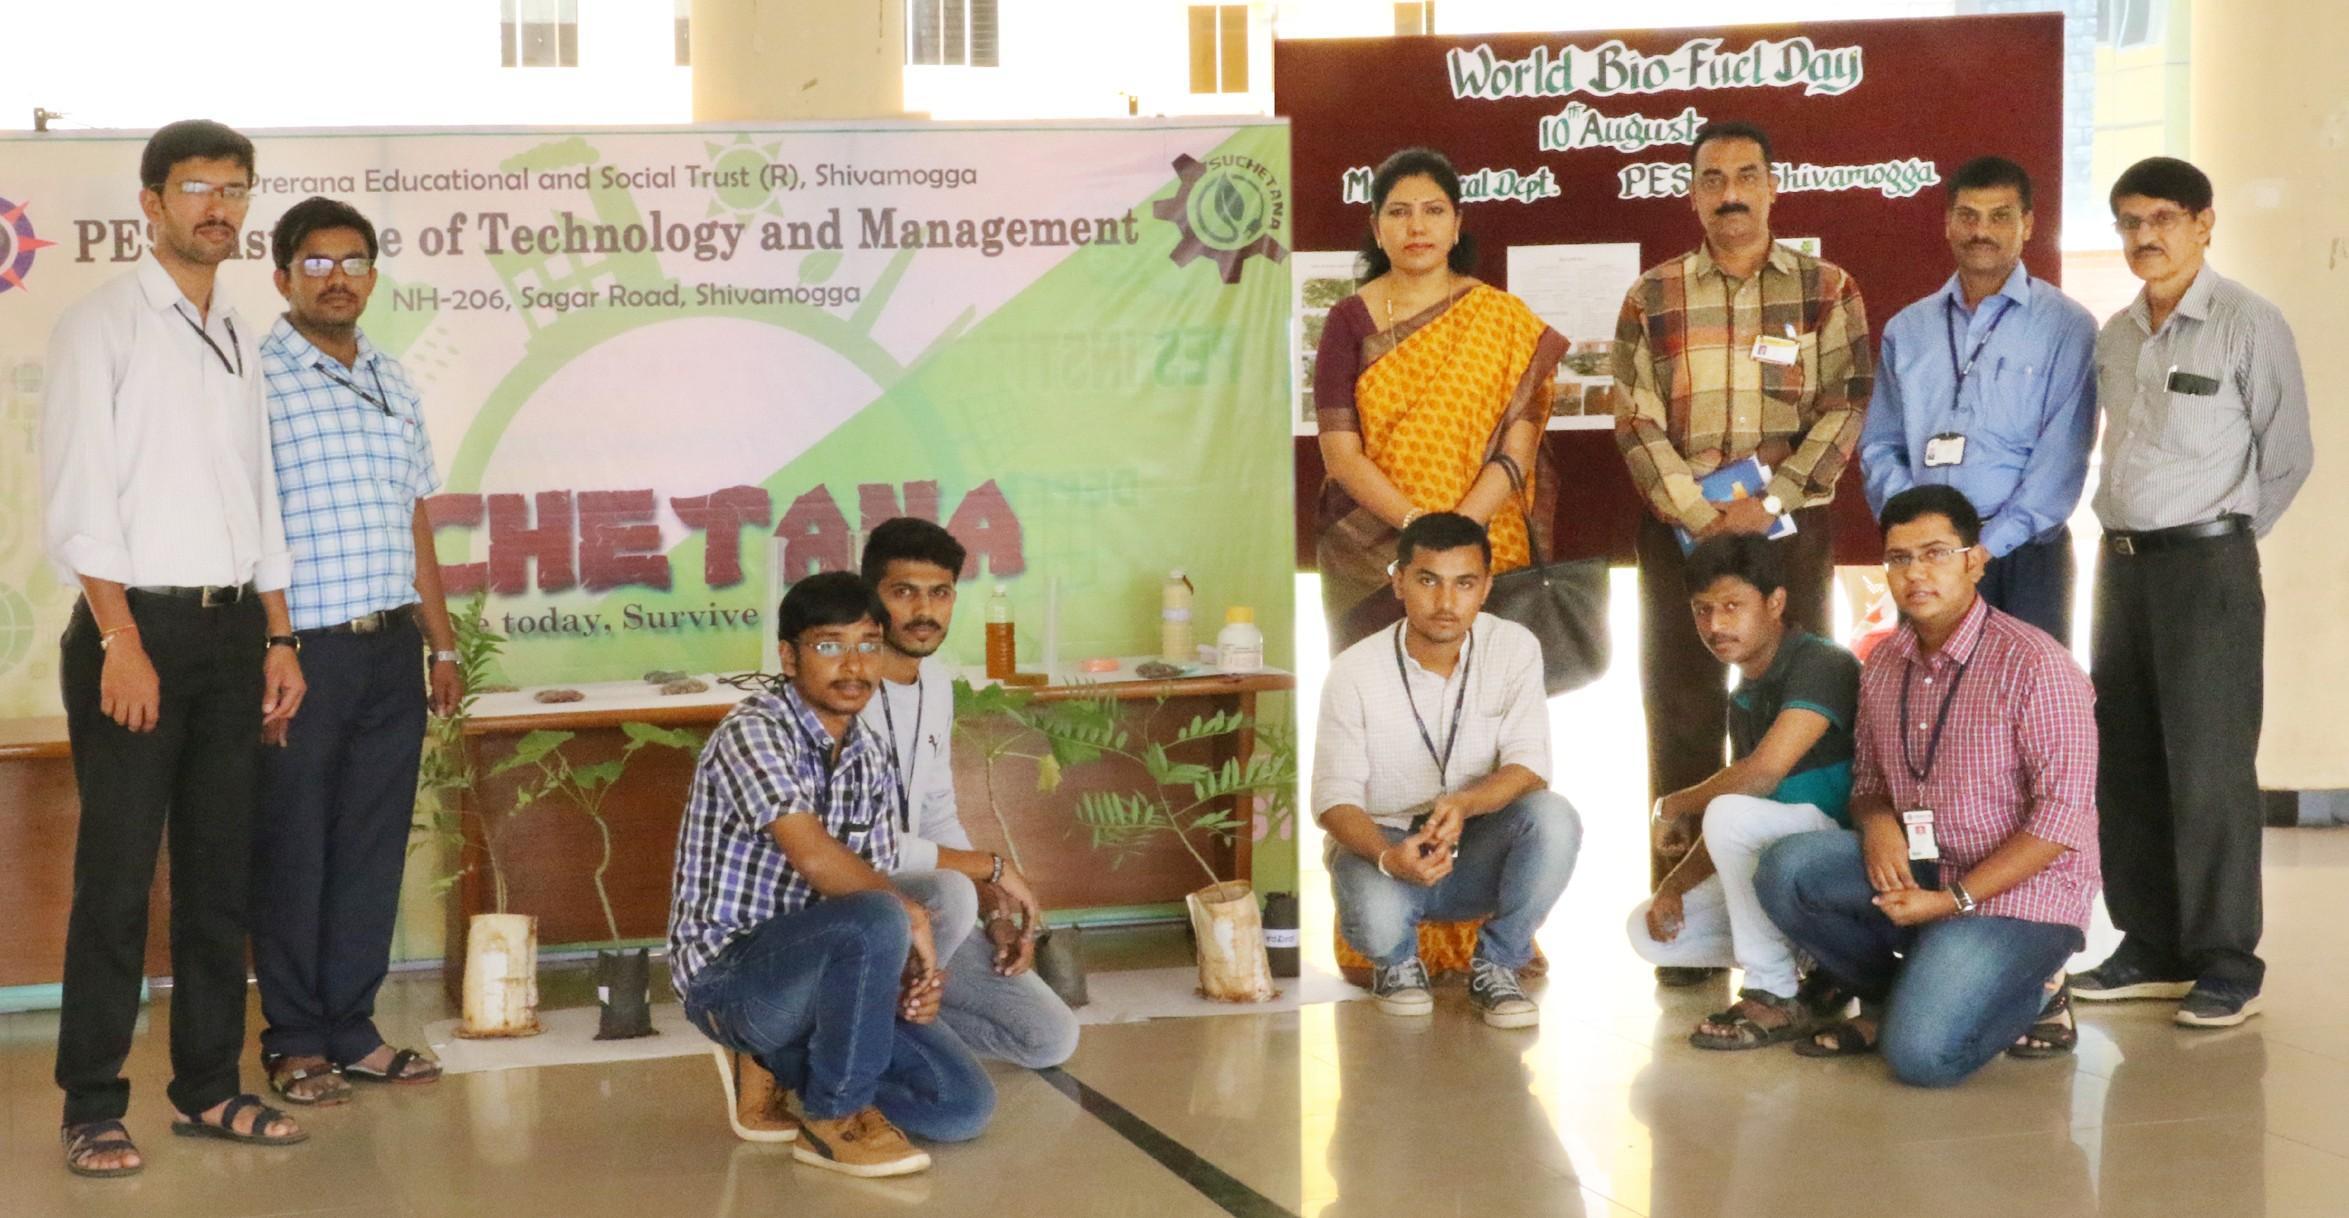 Talk and demonstration on Bio-fuel Renewable energy